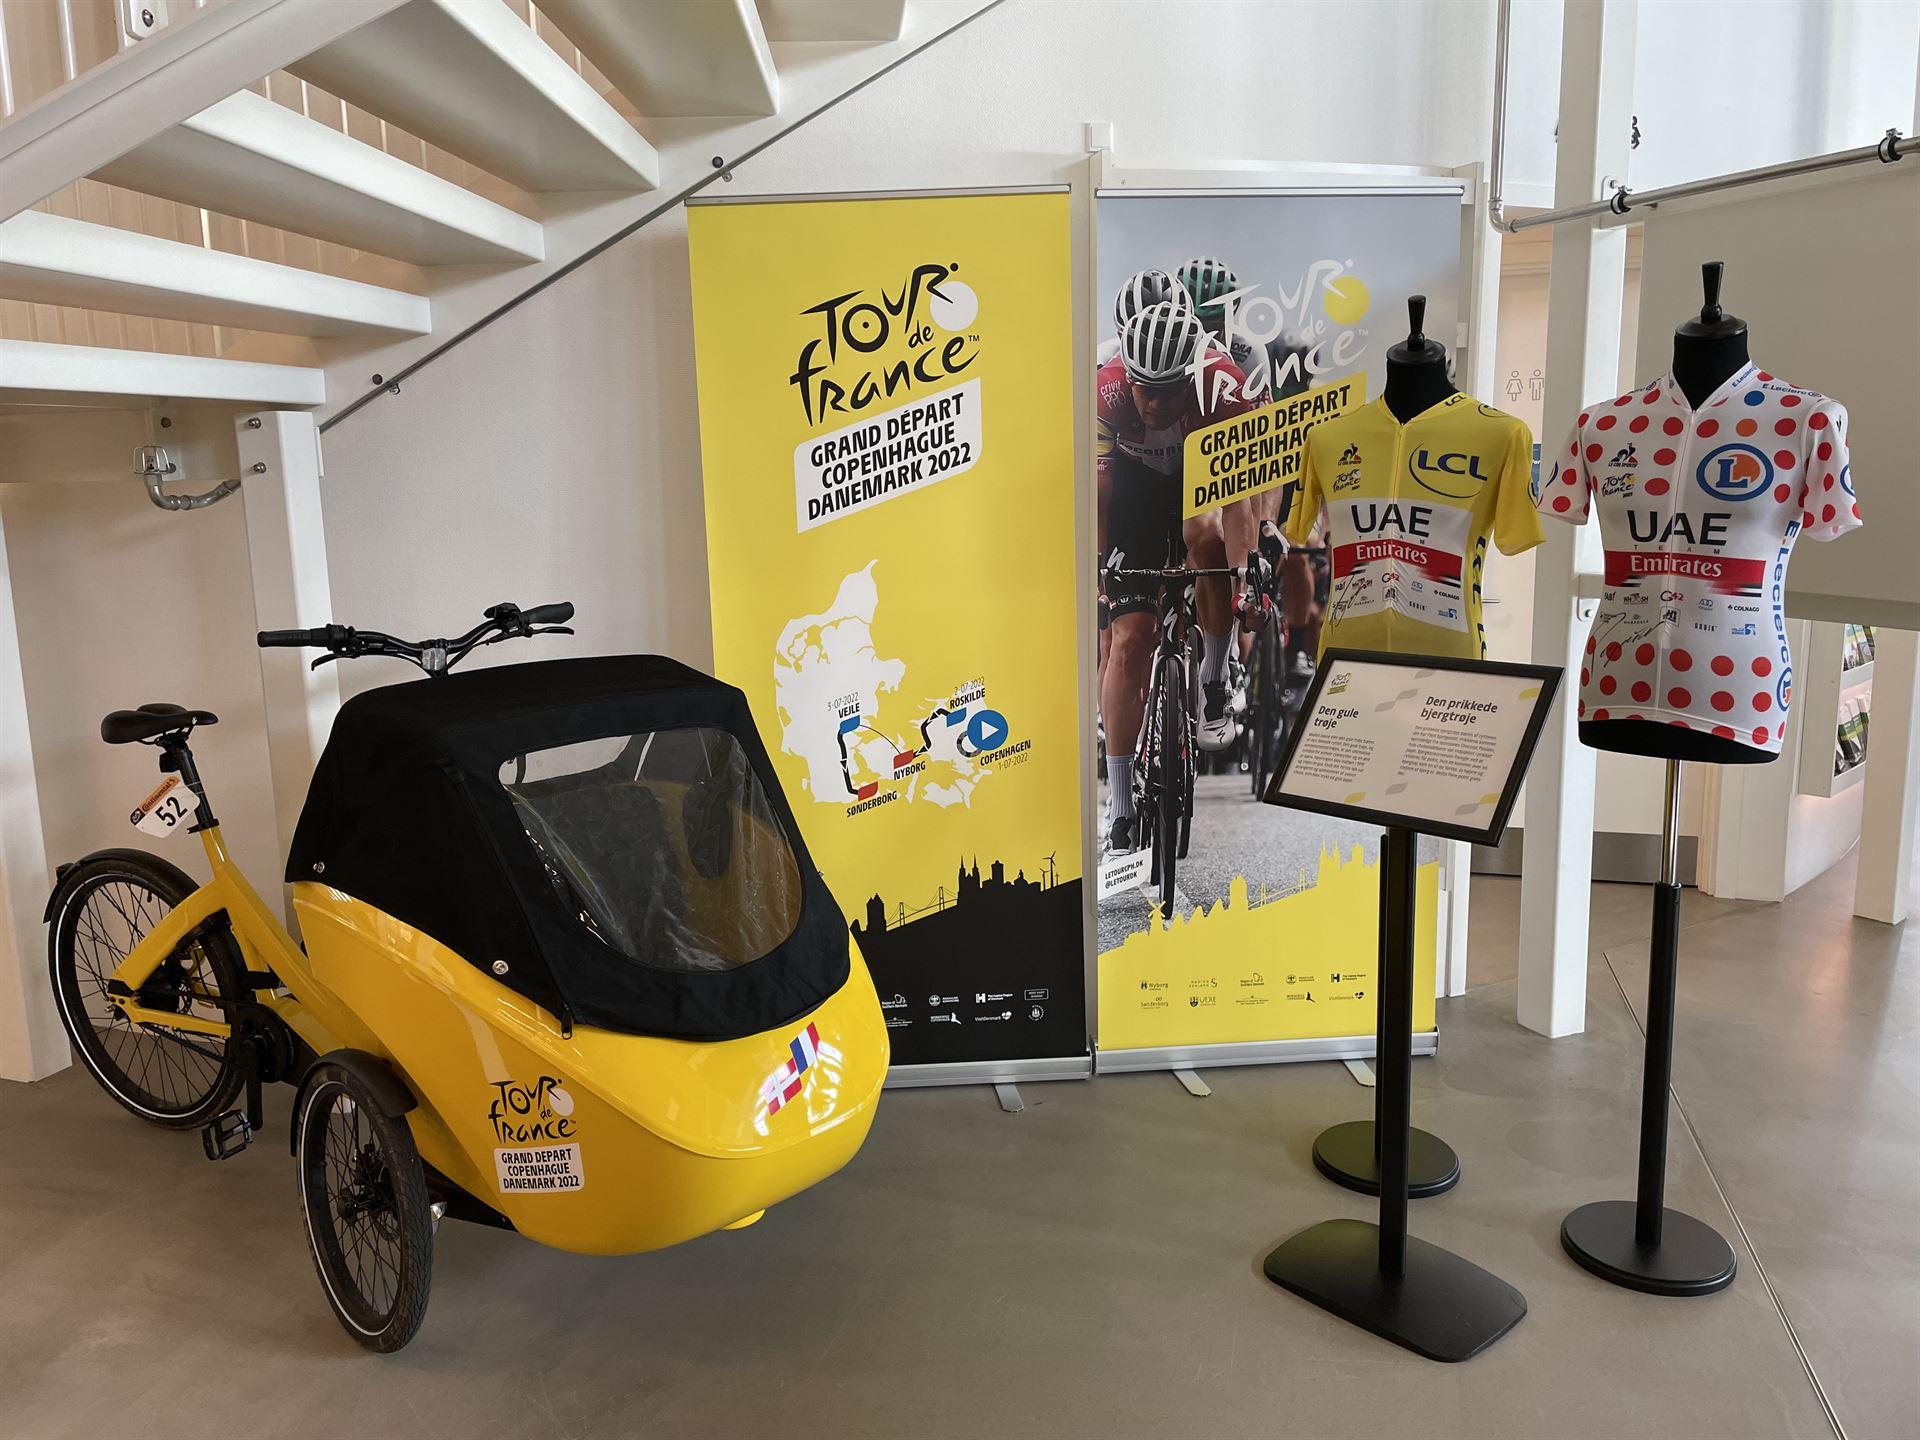 Den gule ladcykel som skal fragte trofæet rundt i Danmark Foto: ritzau.dk